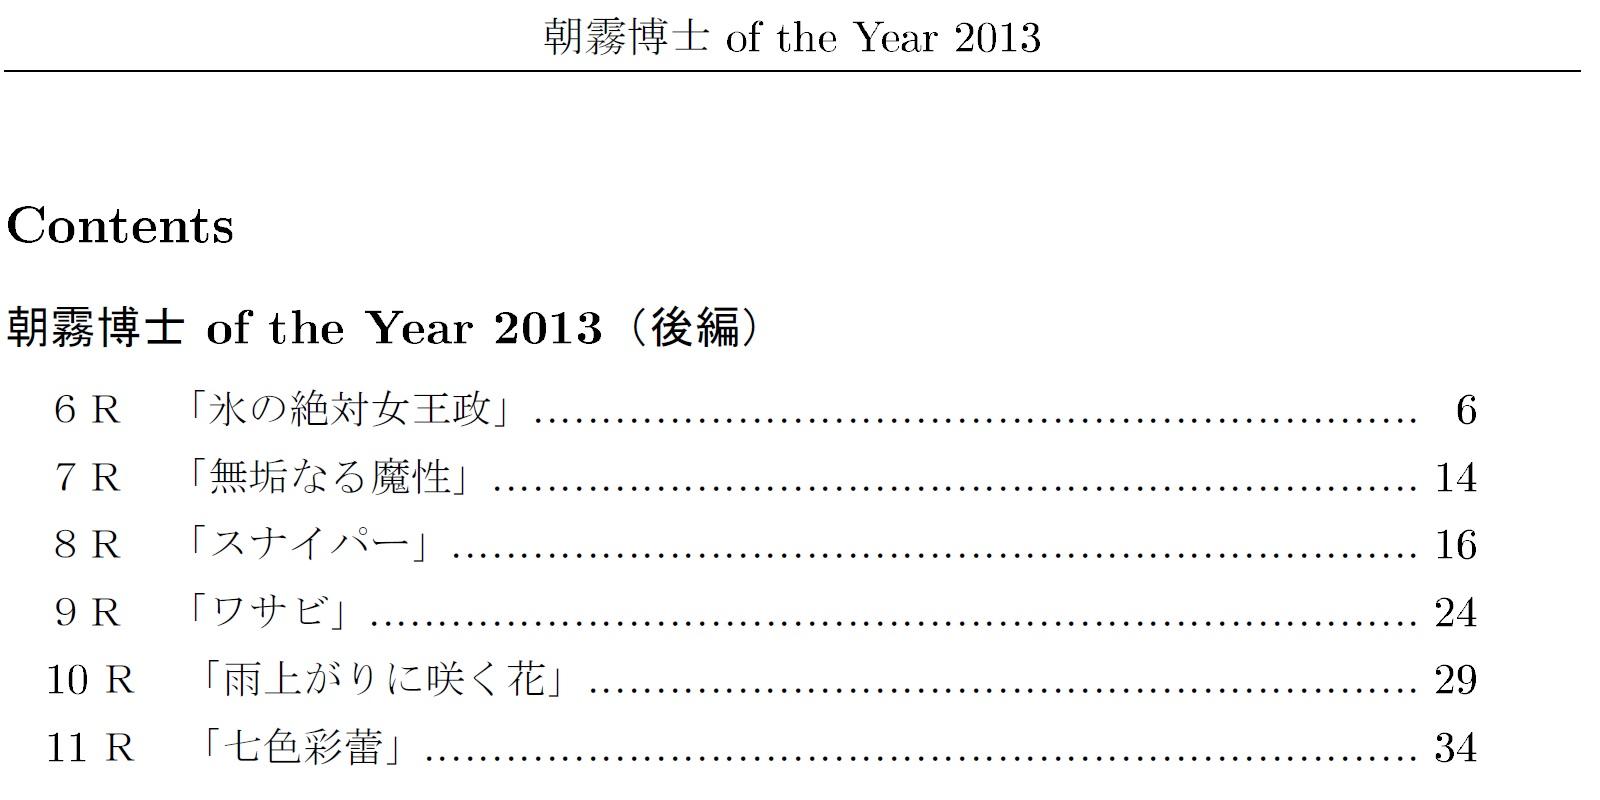 朝霧博士 of the Year 2013(後編)